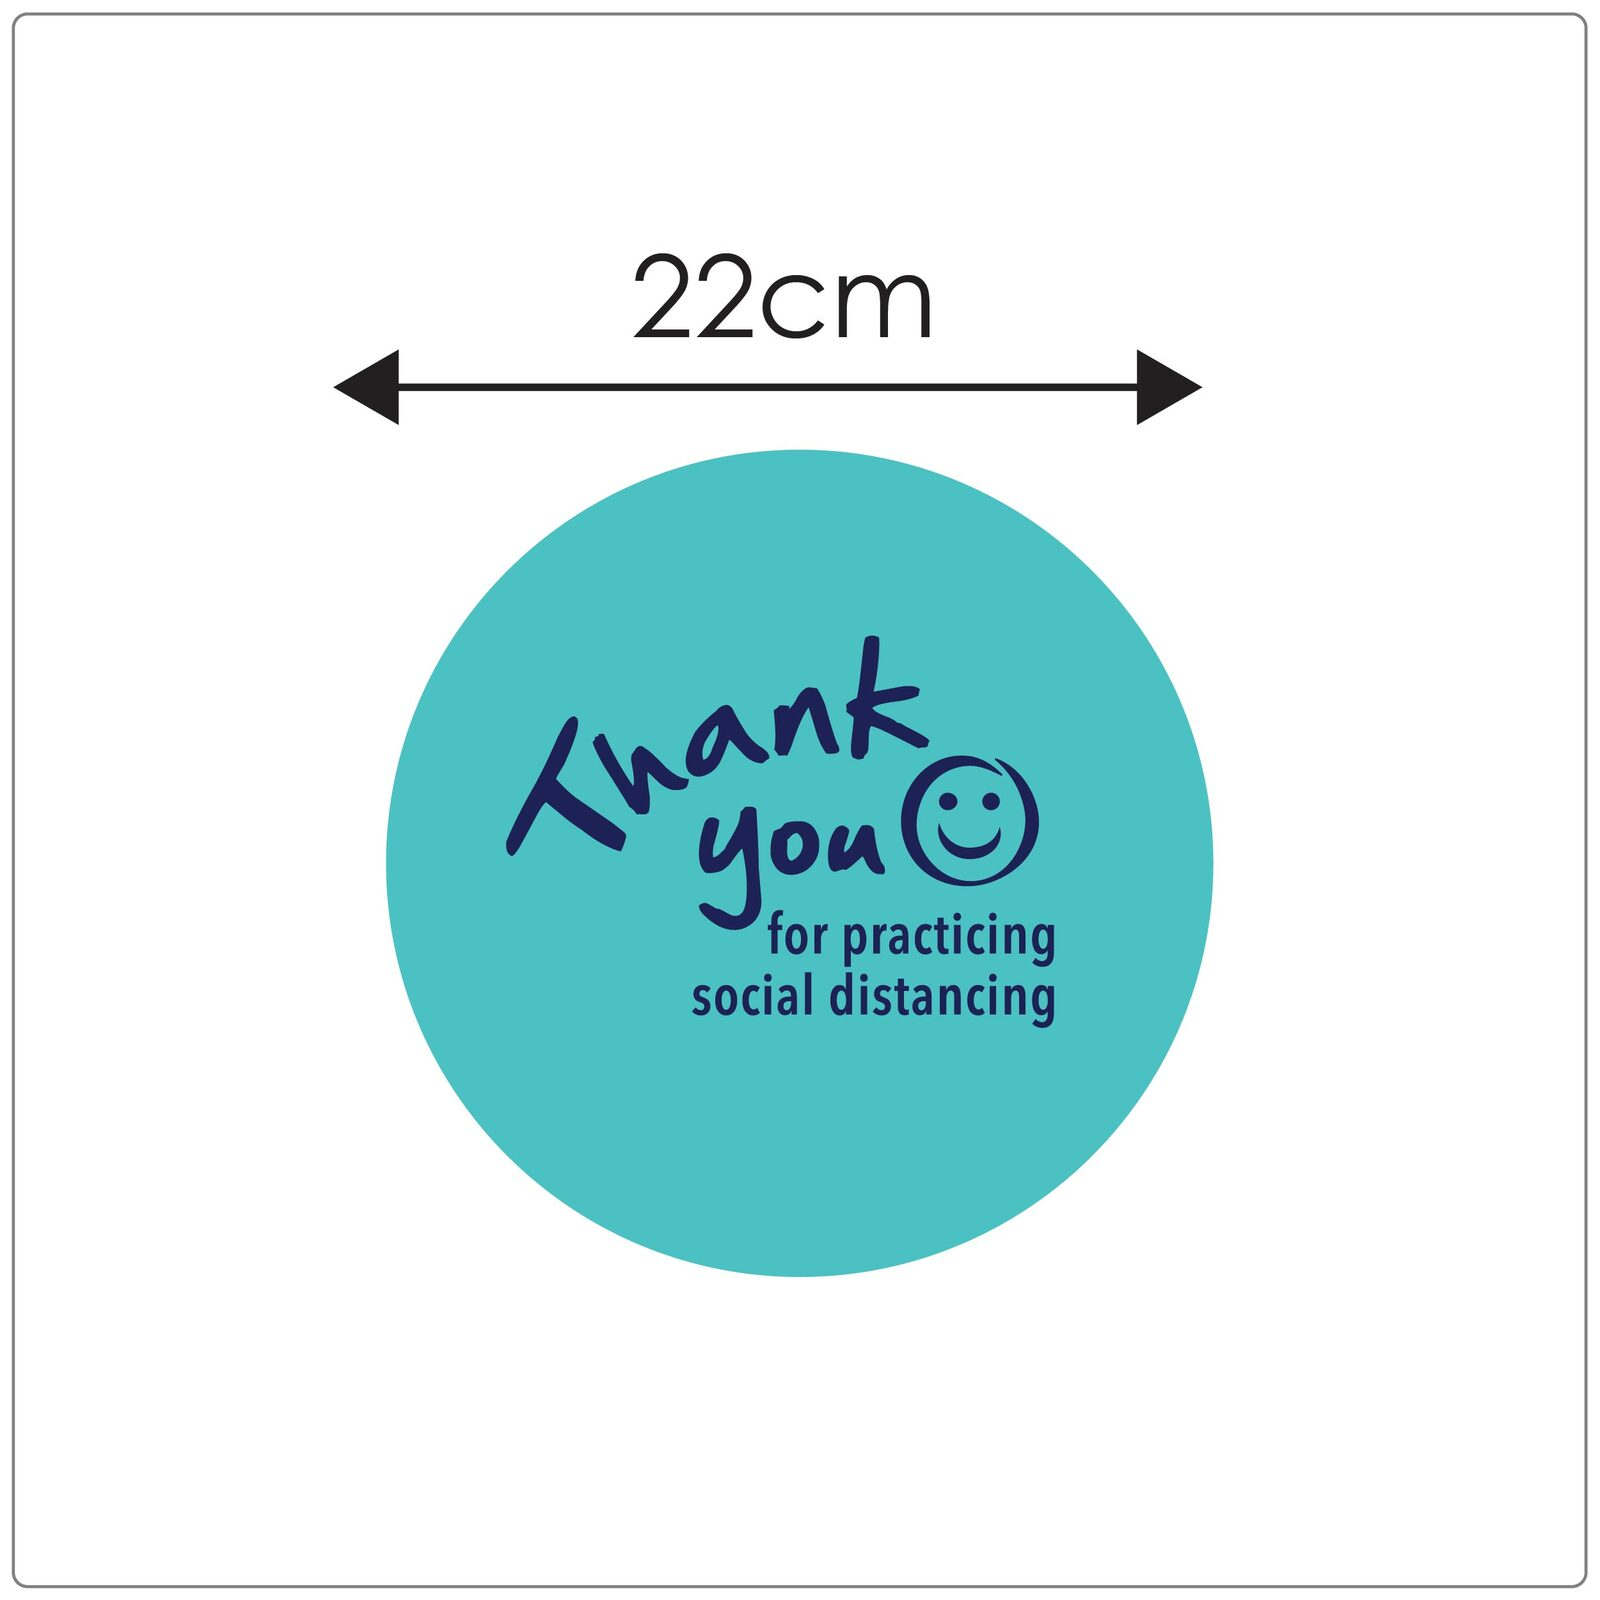 social distancing floor marker for carpet, sizing, teal Self-adhesive Corona virus floor marker to help social distancing